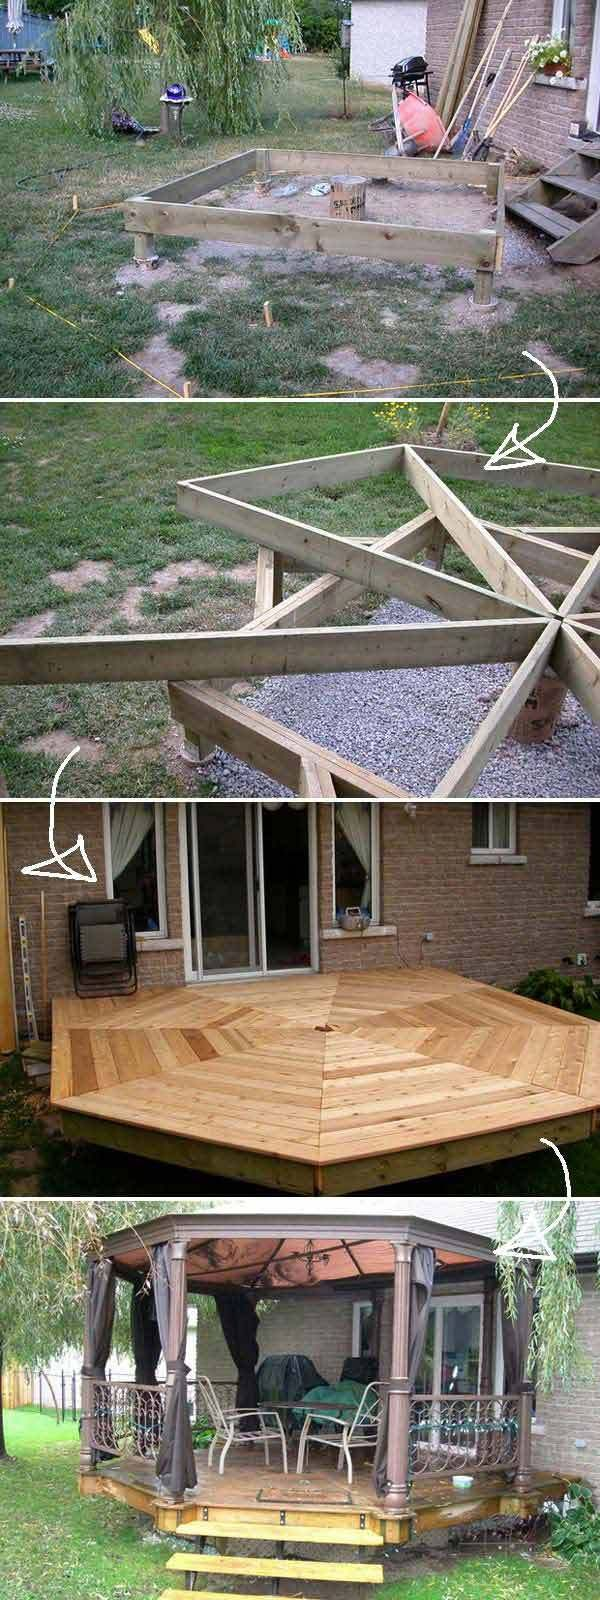 How To Build An Octagonal Deck Building A Floating Deck Building A Deck Floating Deck